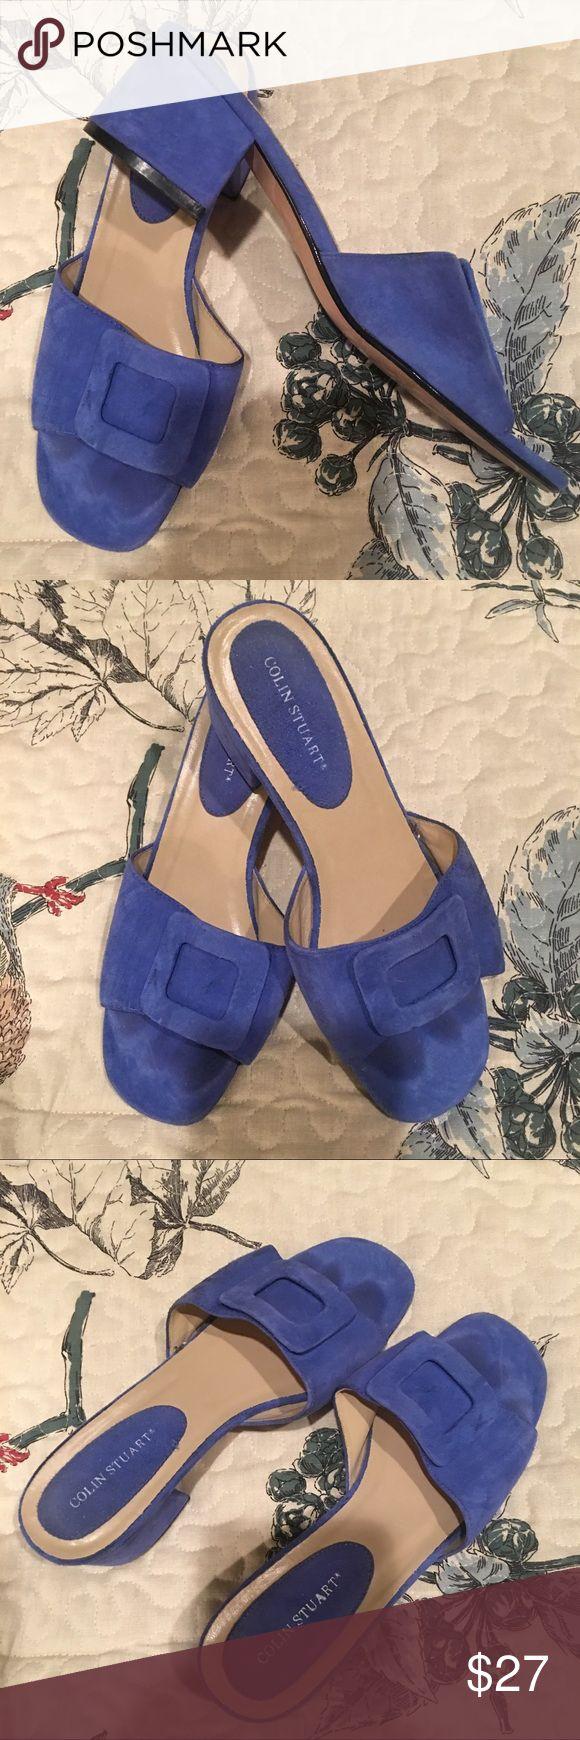 Colin Stuart Slides Mule Shoes 7.5 Very on trend adorable blue Colin Stuart mule shoes. These sandal slides are adorable. Size 7.5. Colin Stuart Shoes Sandals